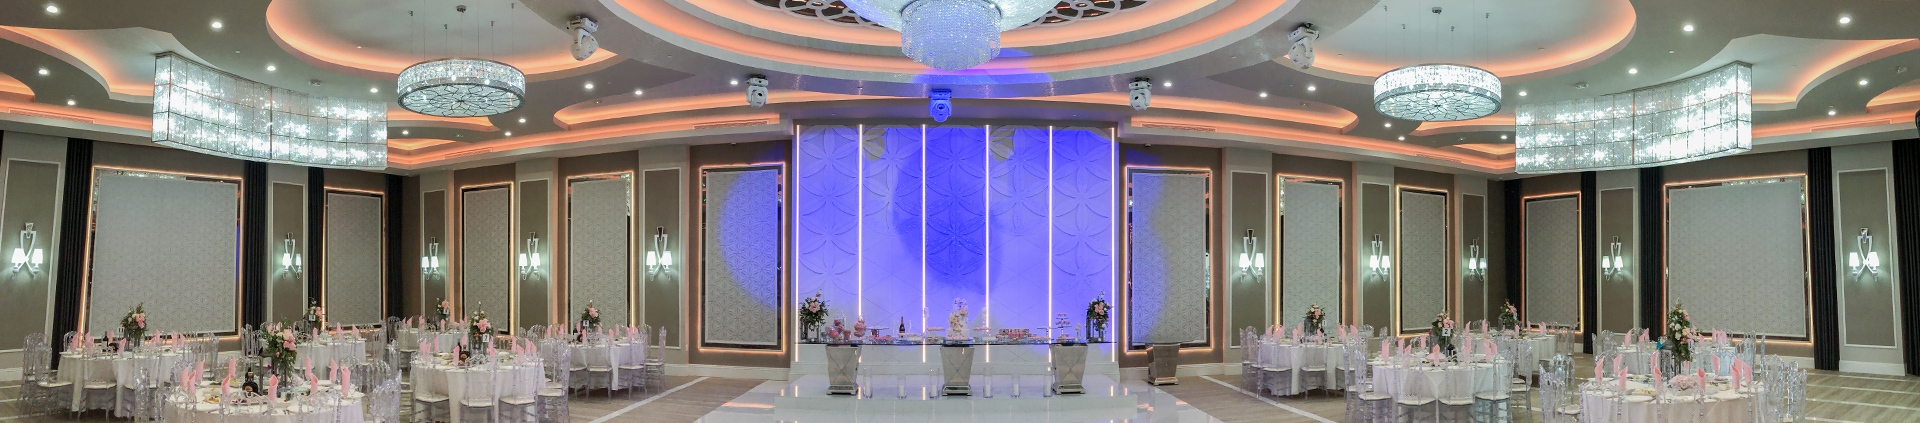 Avanti Banquet Hall